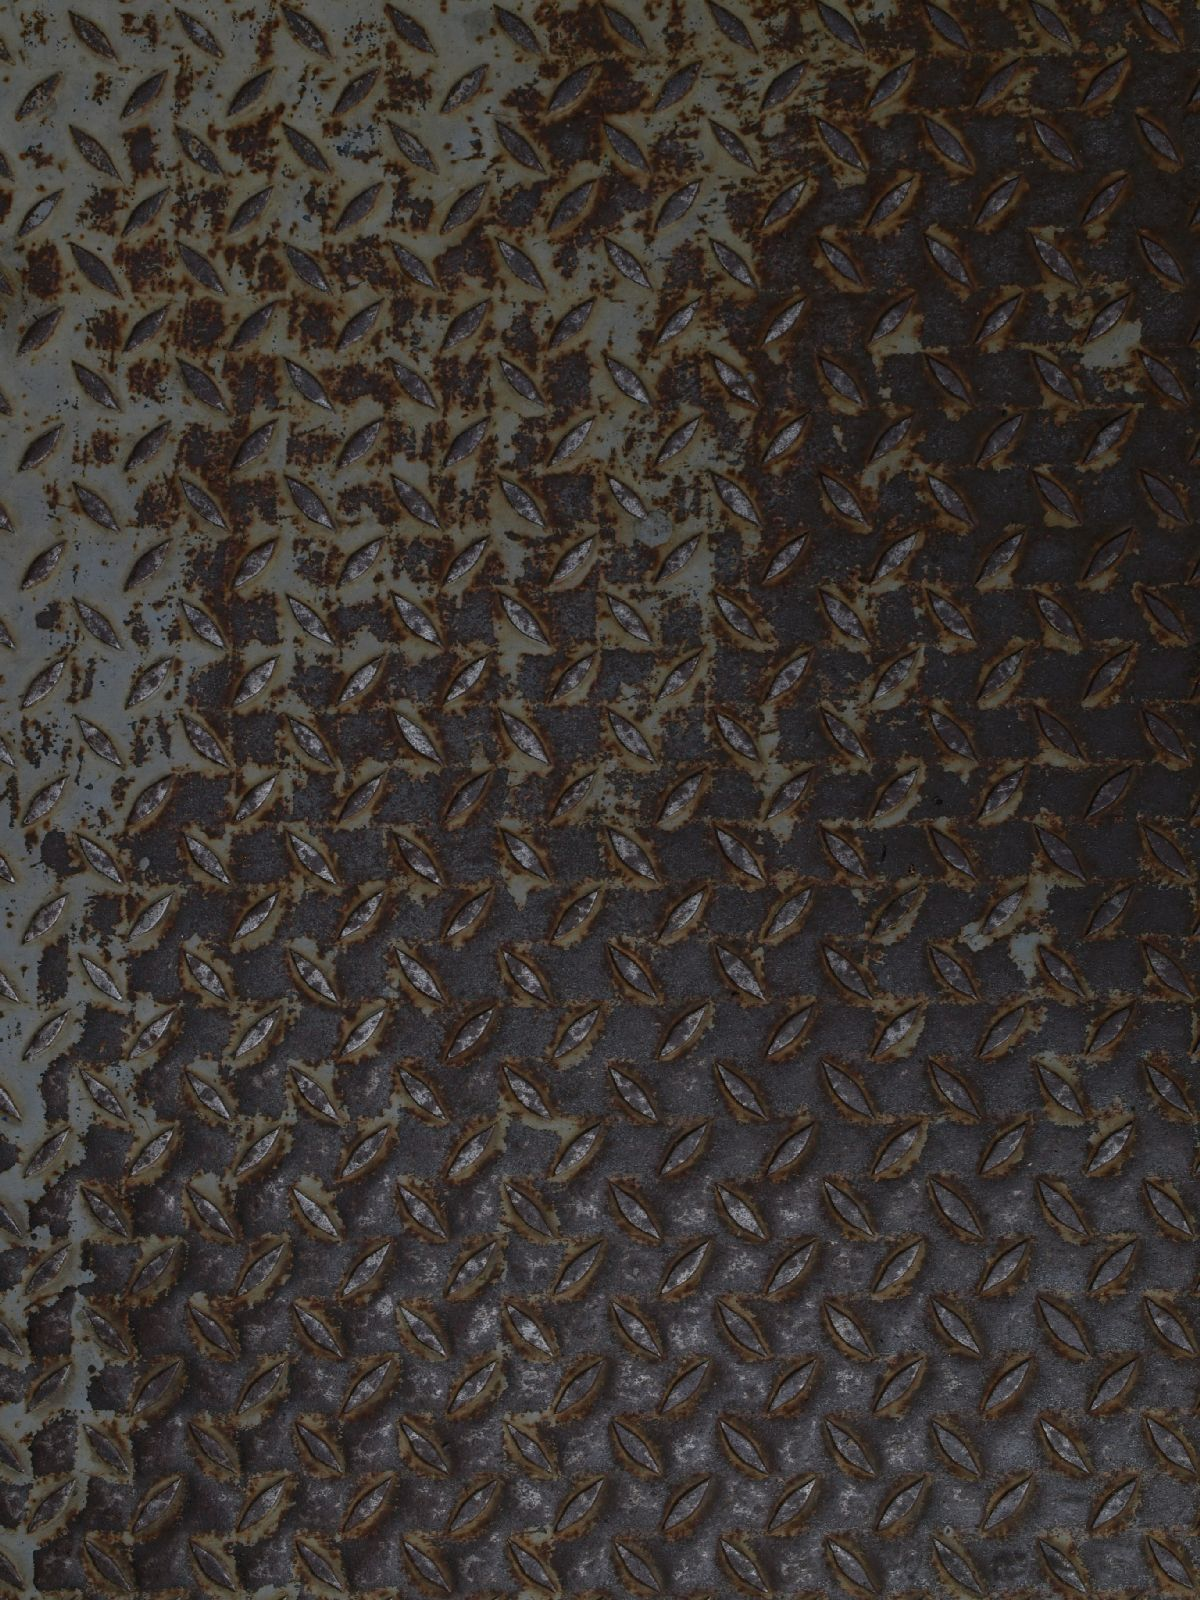 Metall_Textur_A_P4131067